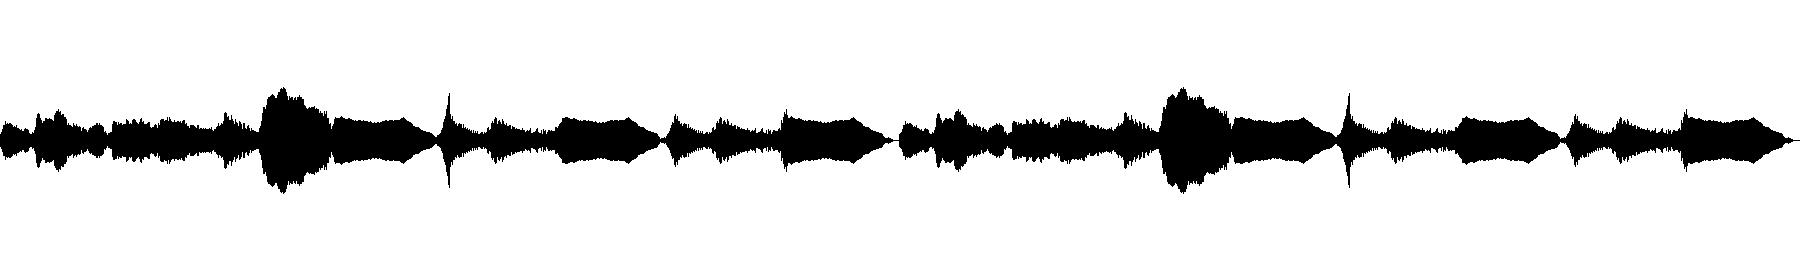 yoshi potion trippy flute 160bpm a